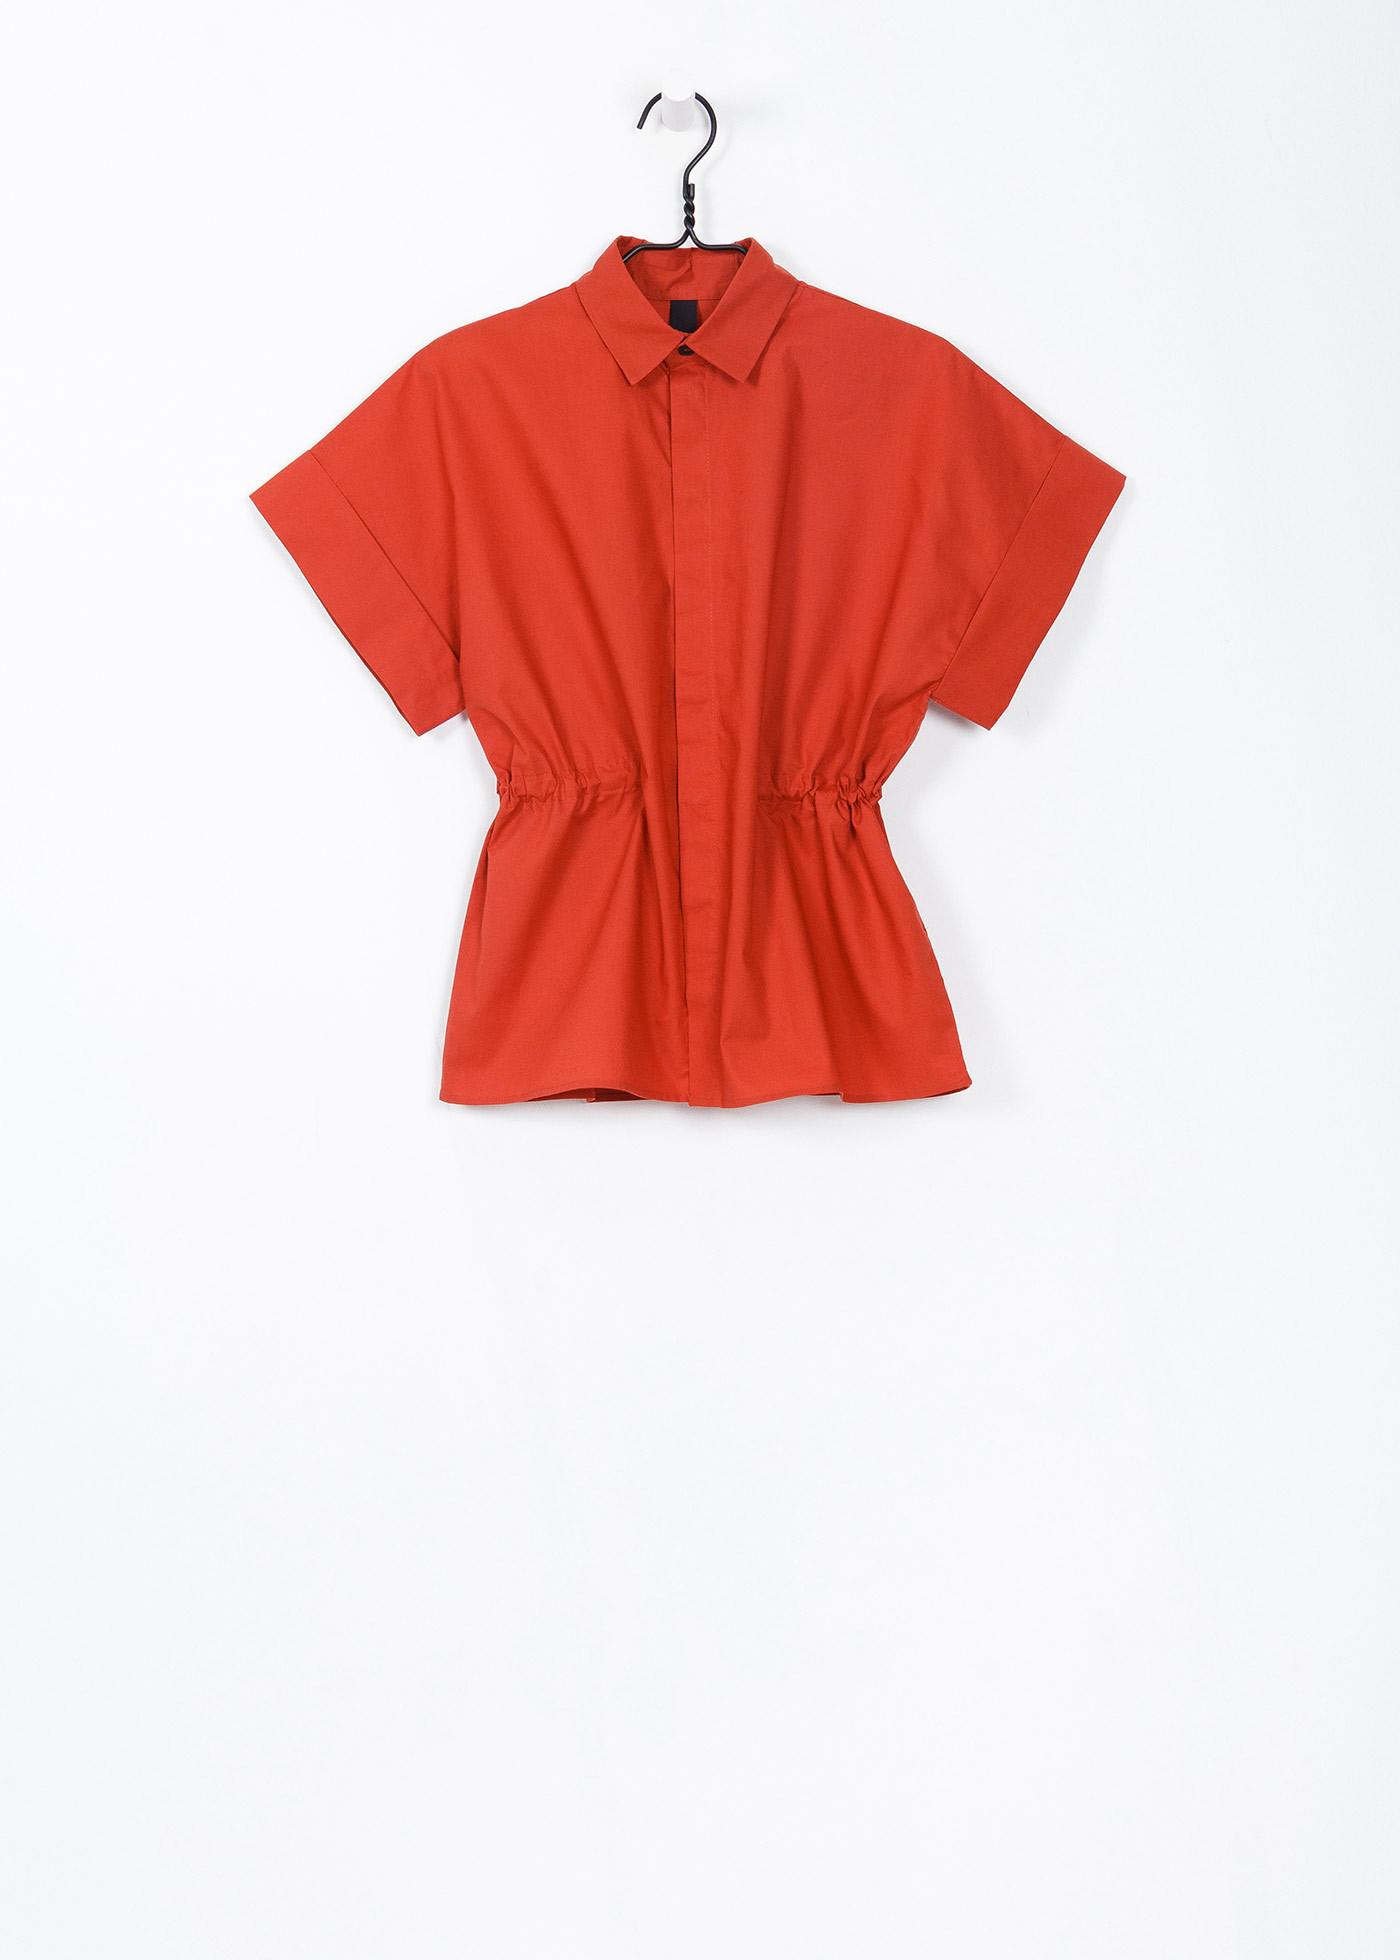 Form Shirt red.jpg